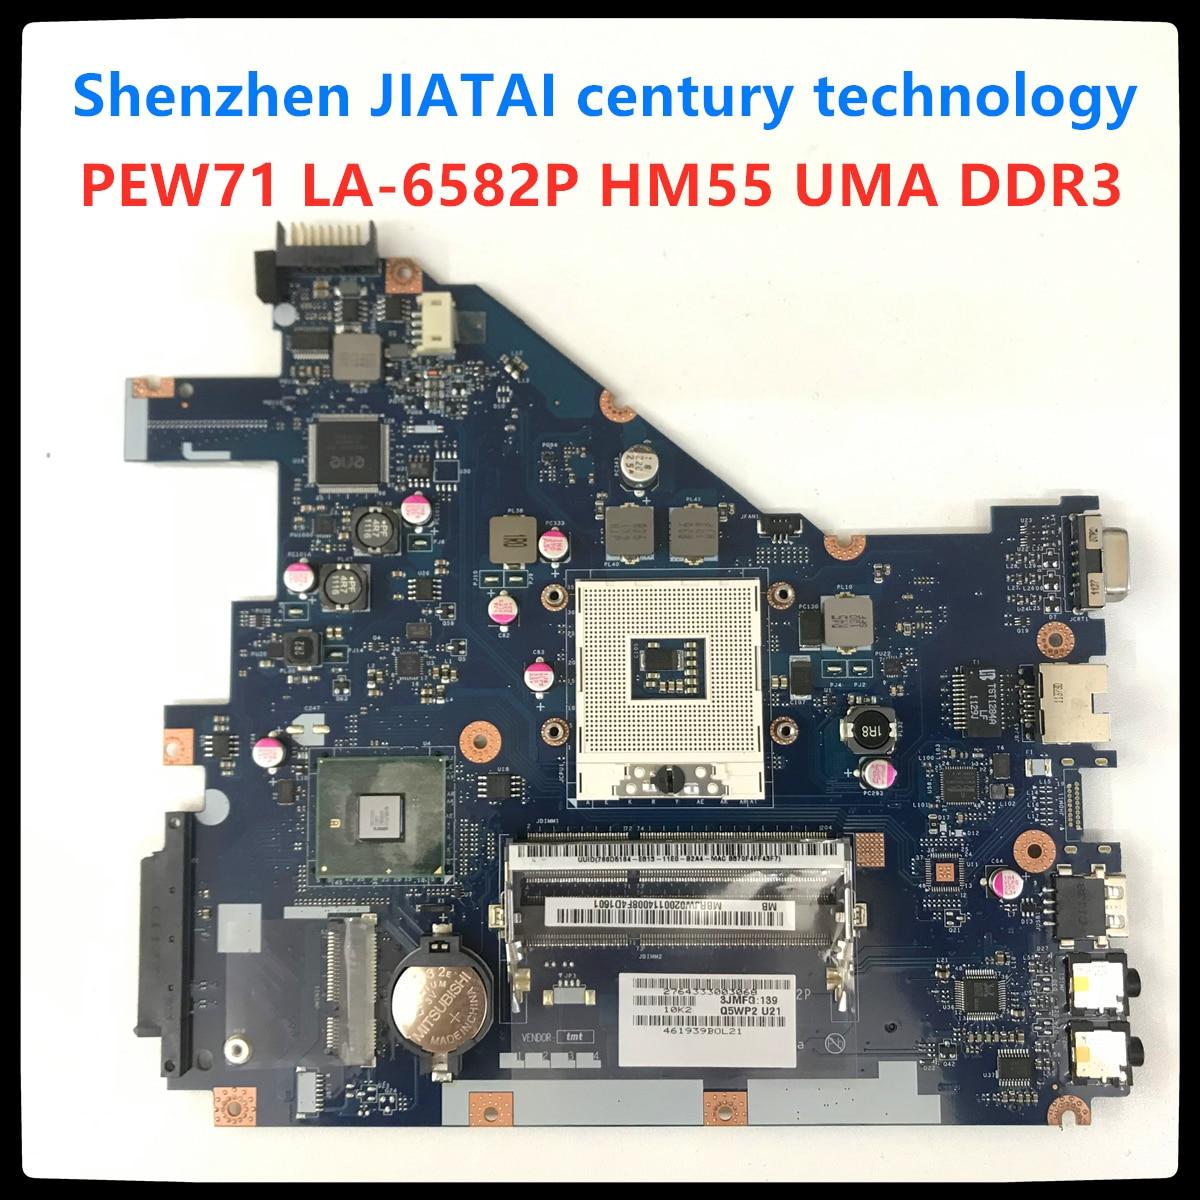 LA-6582P para Acer aspire 5742G 5733 5742Z 5733Z 5742 portátil placa base MBRJY02002 PEW71 LA-6582P HM55 UMA DDR3 100% prueba completa